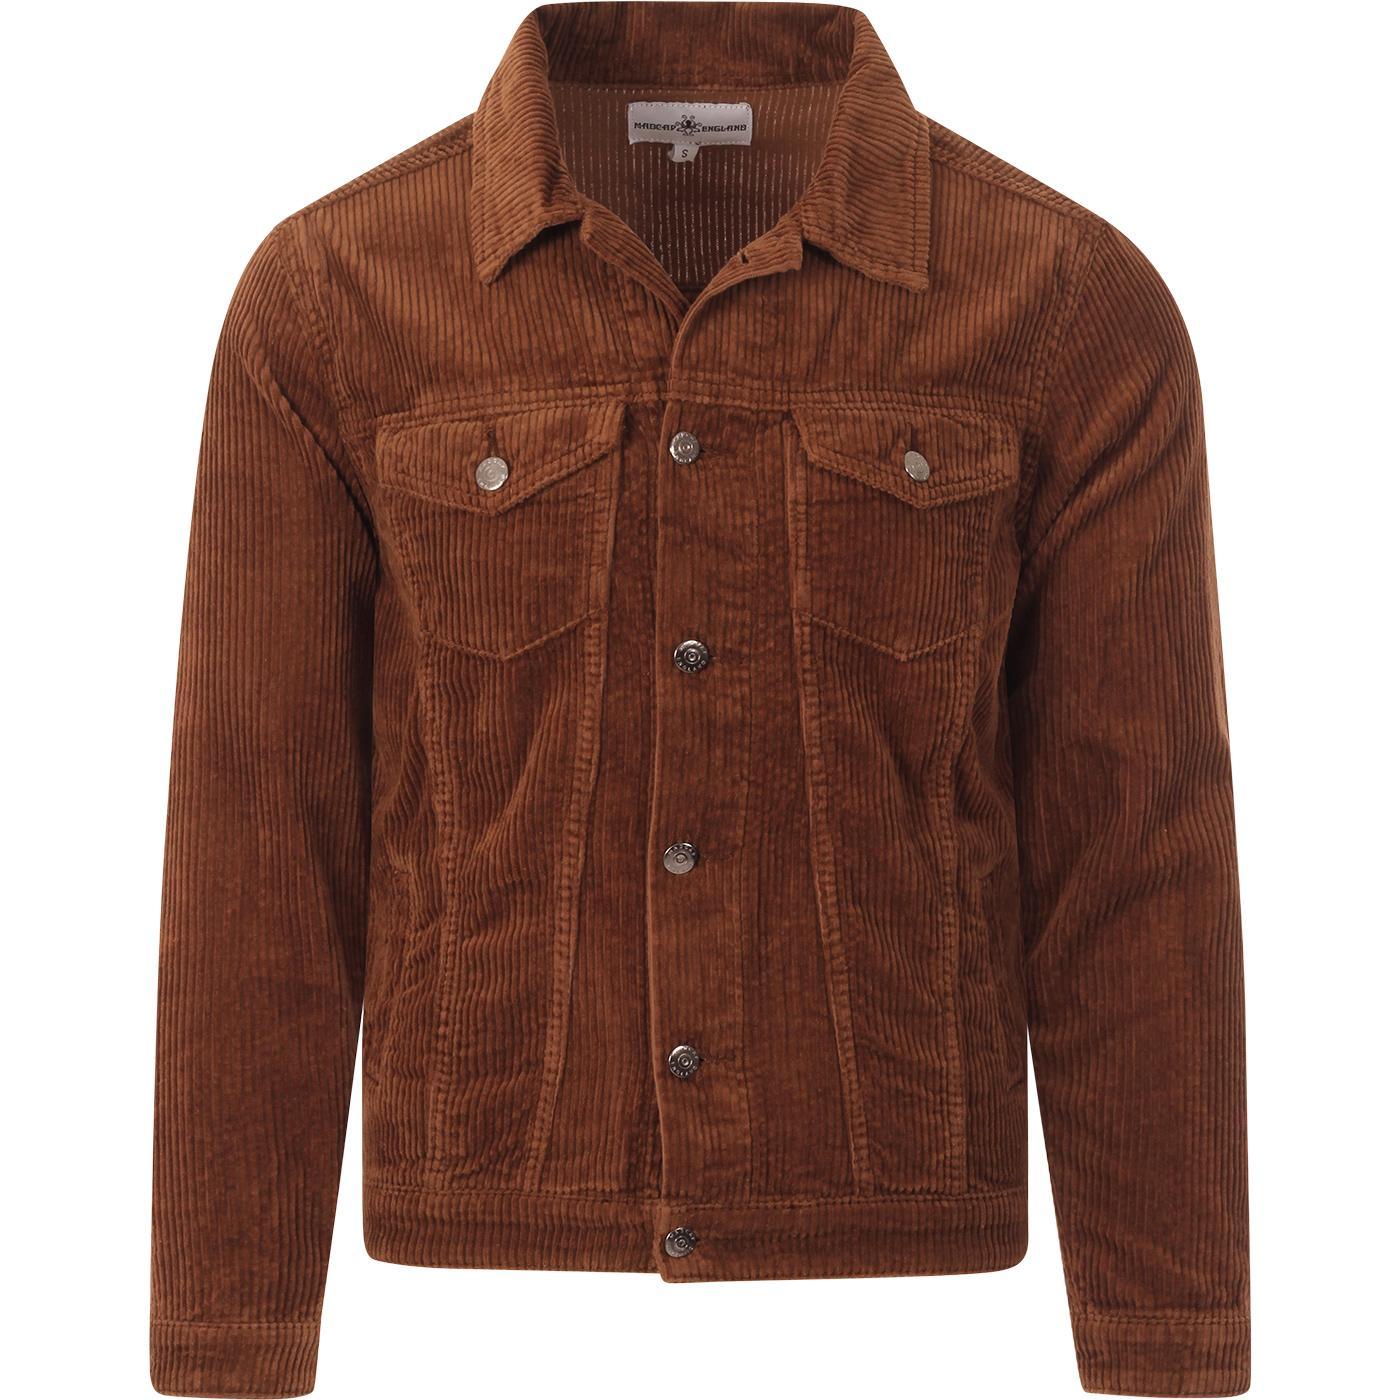 madcap england mens wale jumbo cord western trucker jacket toffee brown